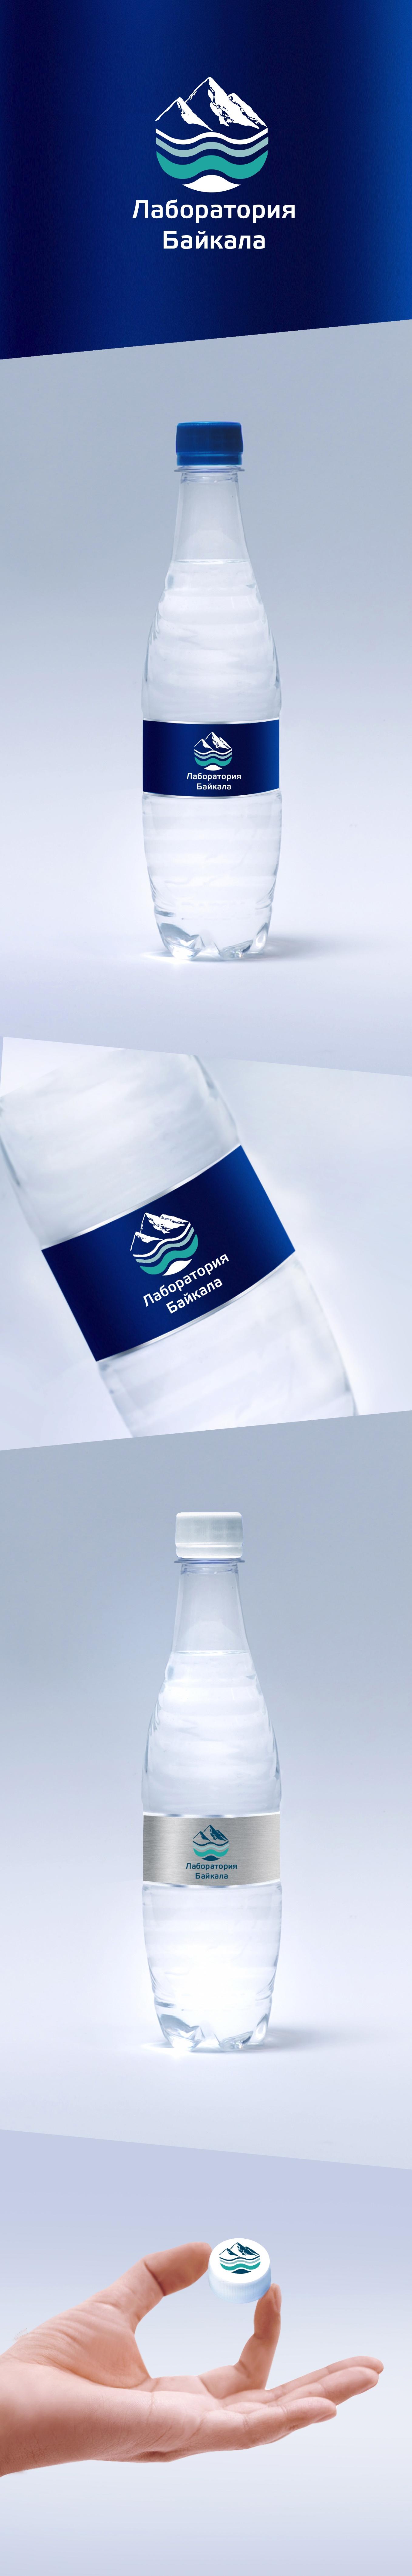 Разработка логотипа торговой марки фото f_7625971b8165aba9.jpg